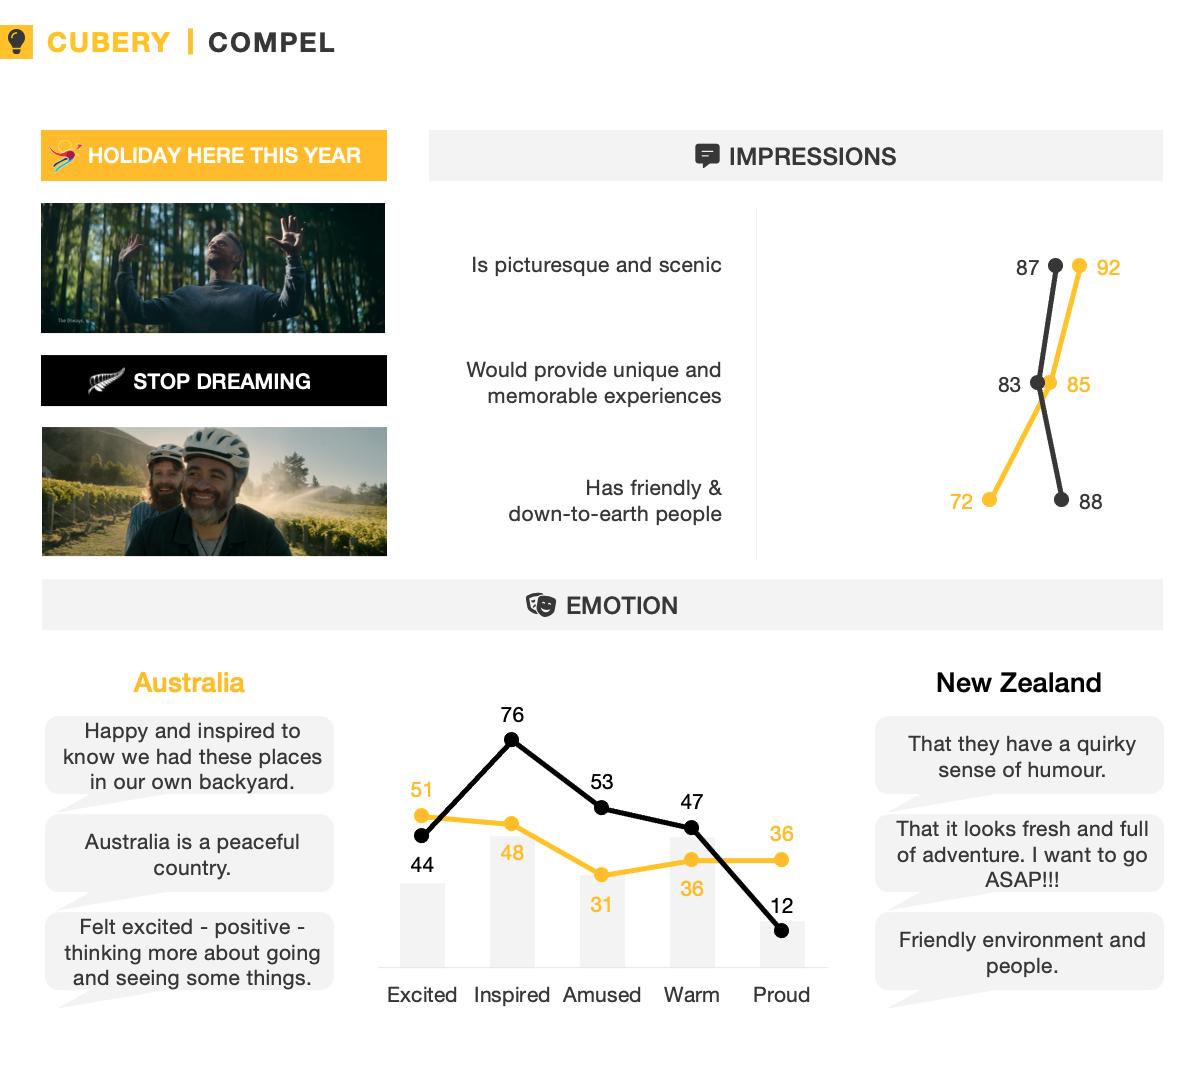 Tourism Australia vs. Tourism New Zealand - Advertising Effectiveness - Compel